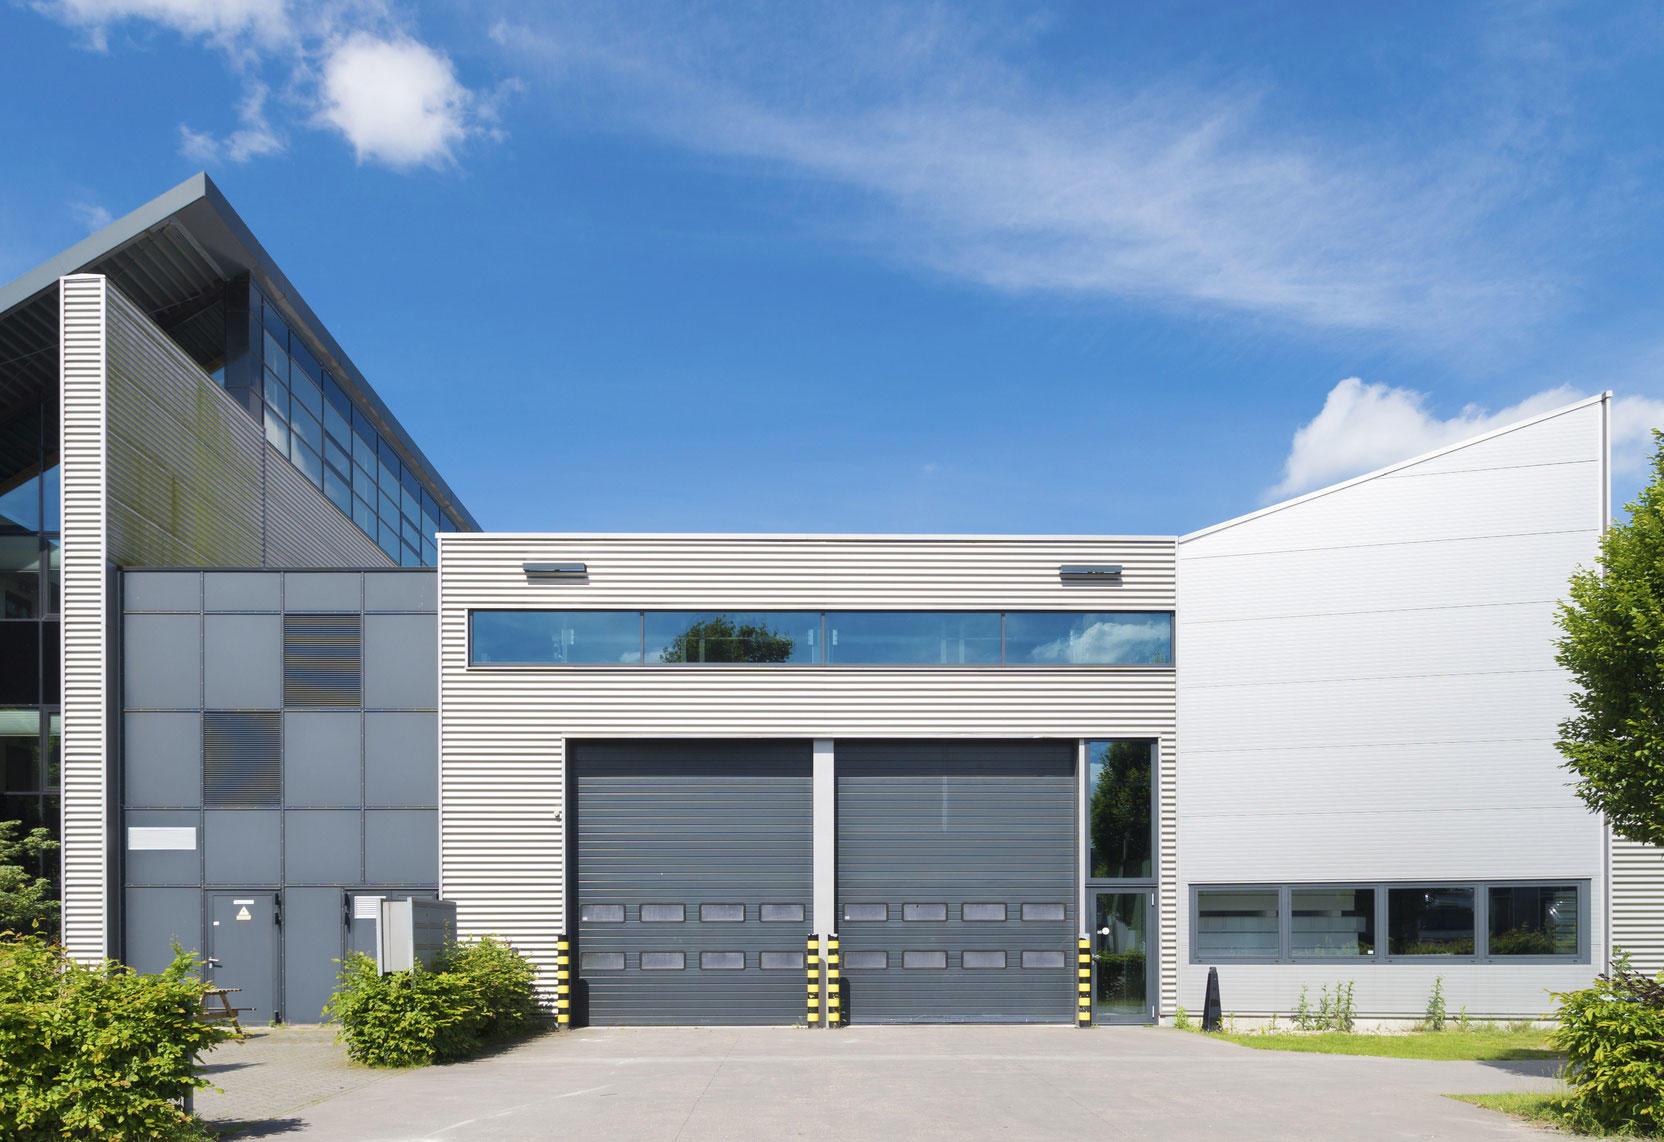 KG HANSA BAUSTAHL Handelsgesellschaft mbH & Co. Hamburg